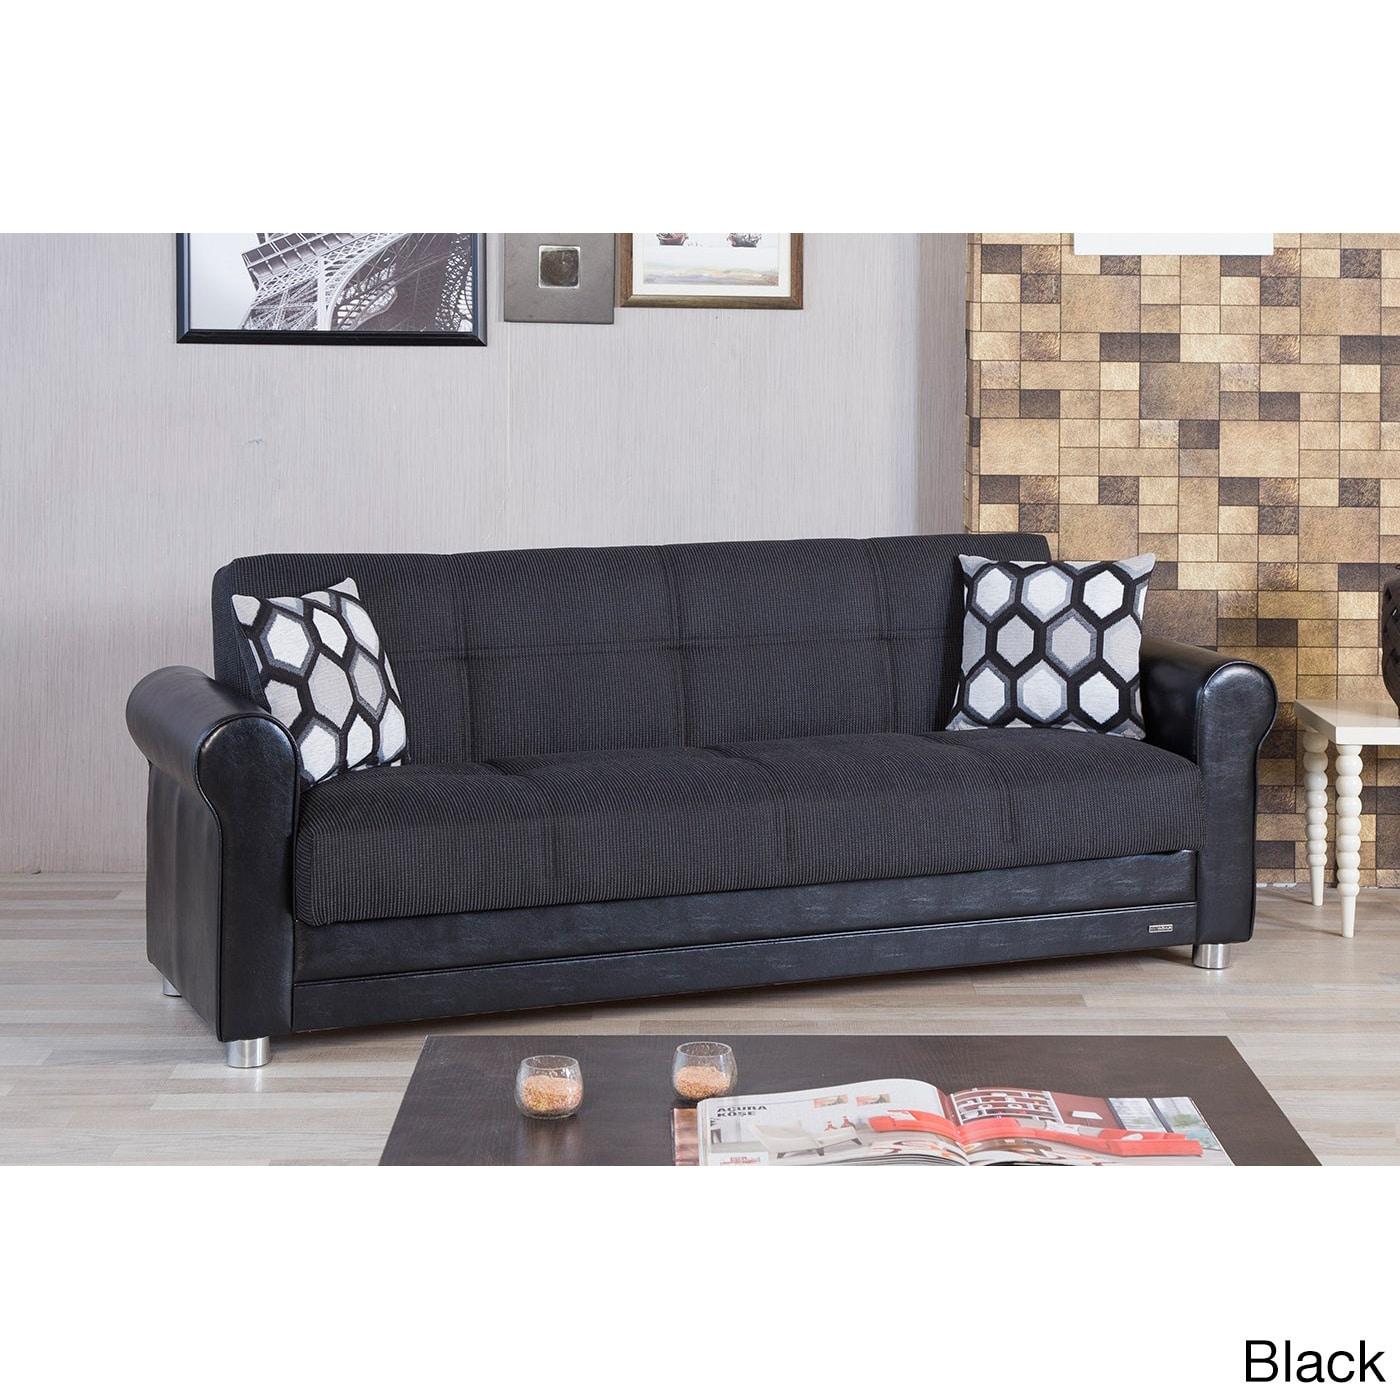 Shop Avalon Futon Convertible Sleeper Sofa Bed - On Sale - Free ...